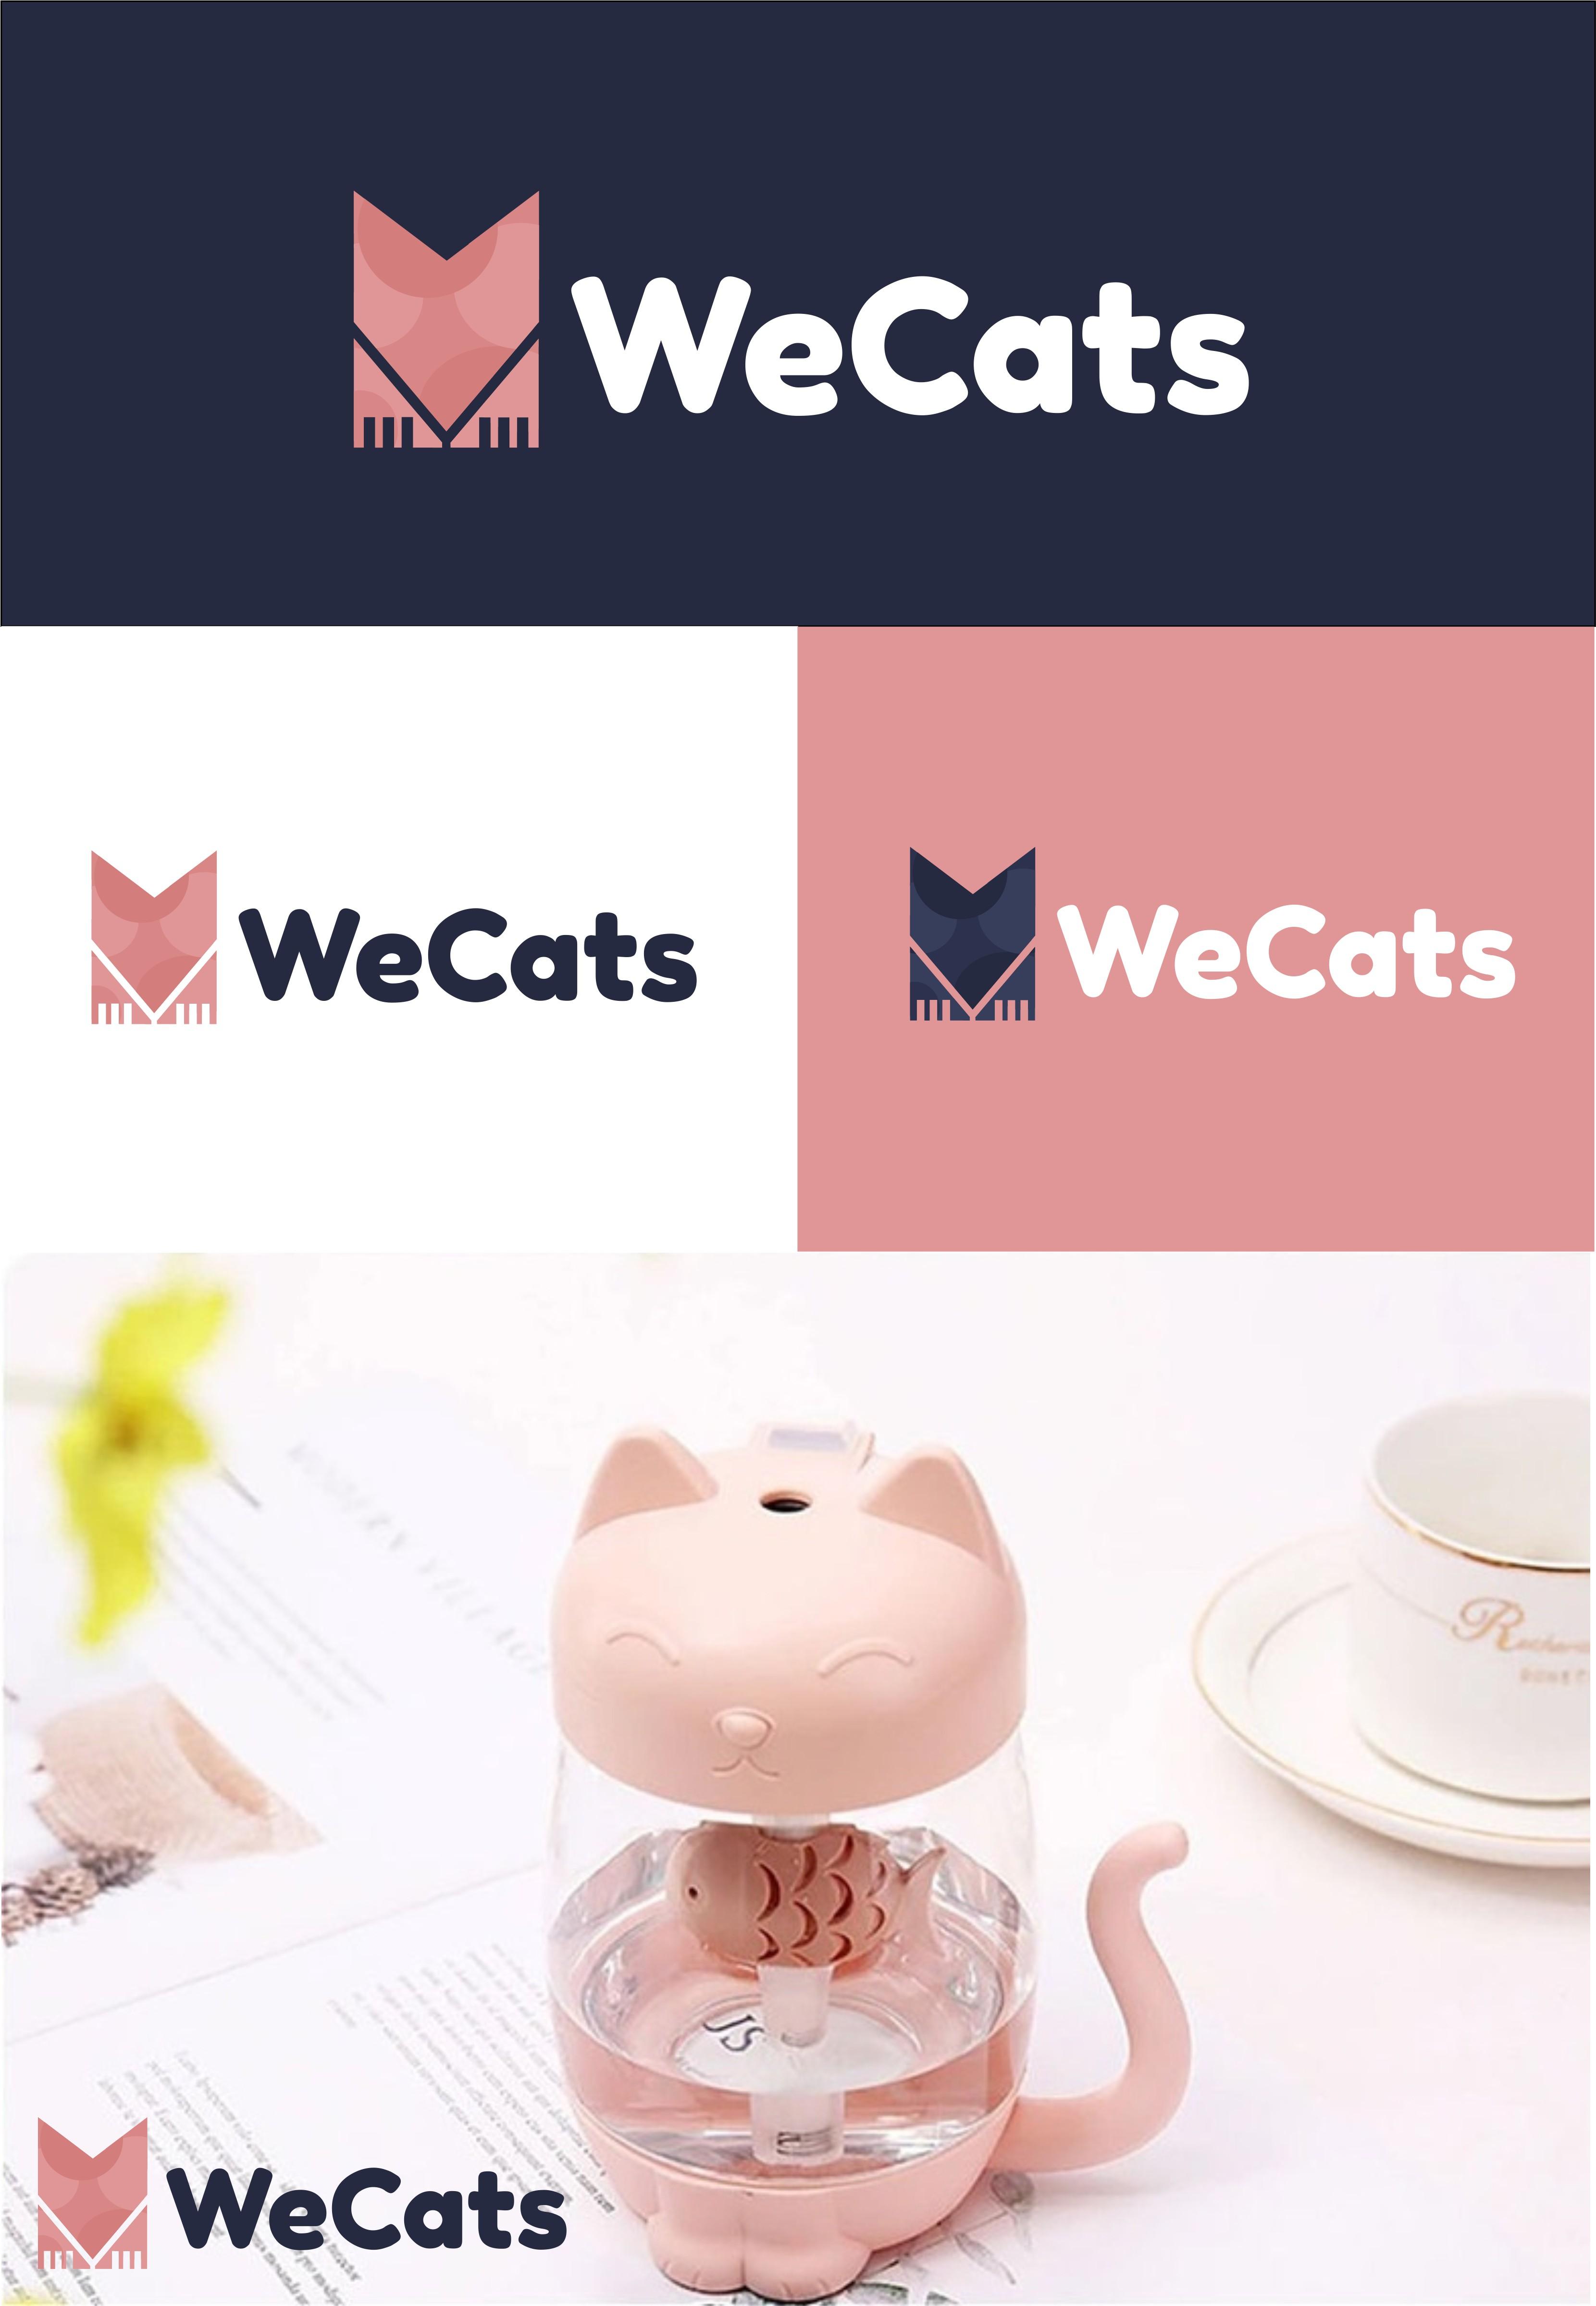 Создание логотипа WeCats фото f_1145f1987856cdbe.jpg